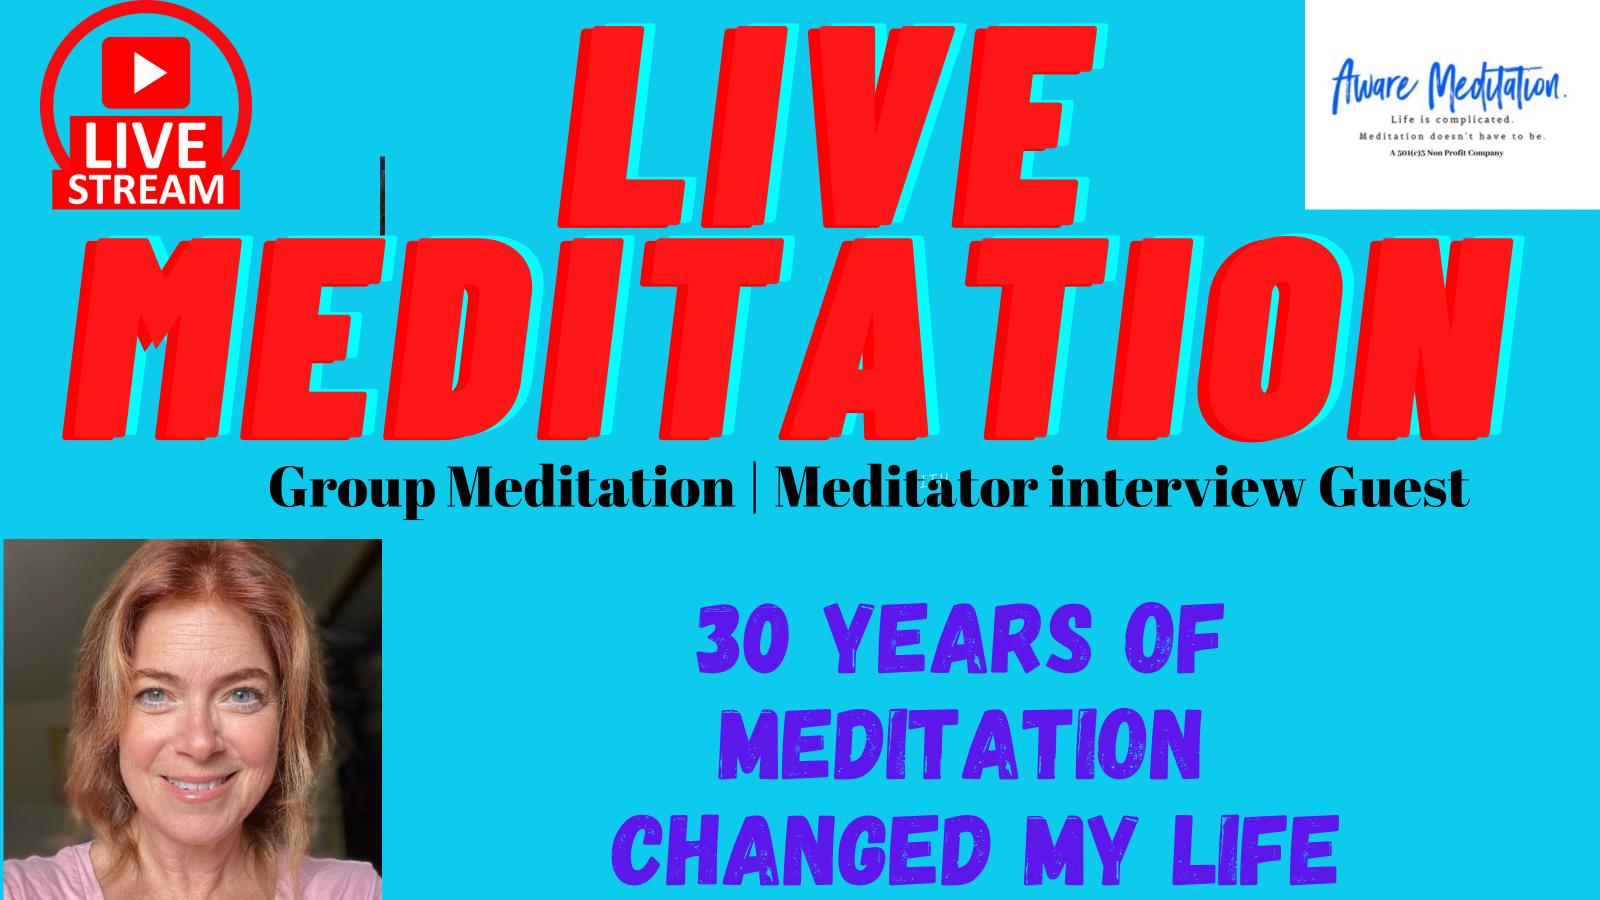 Livestream Group Meditation and Image